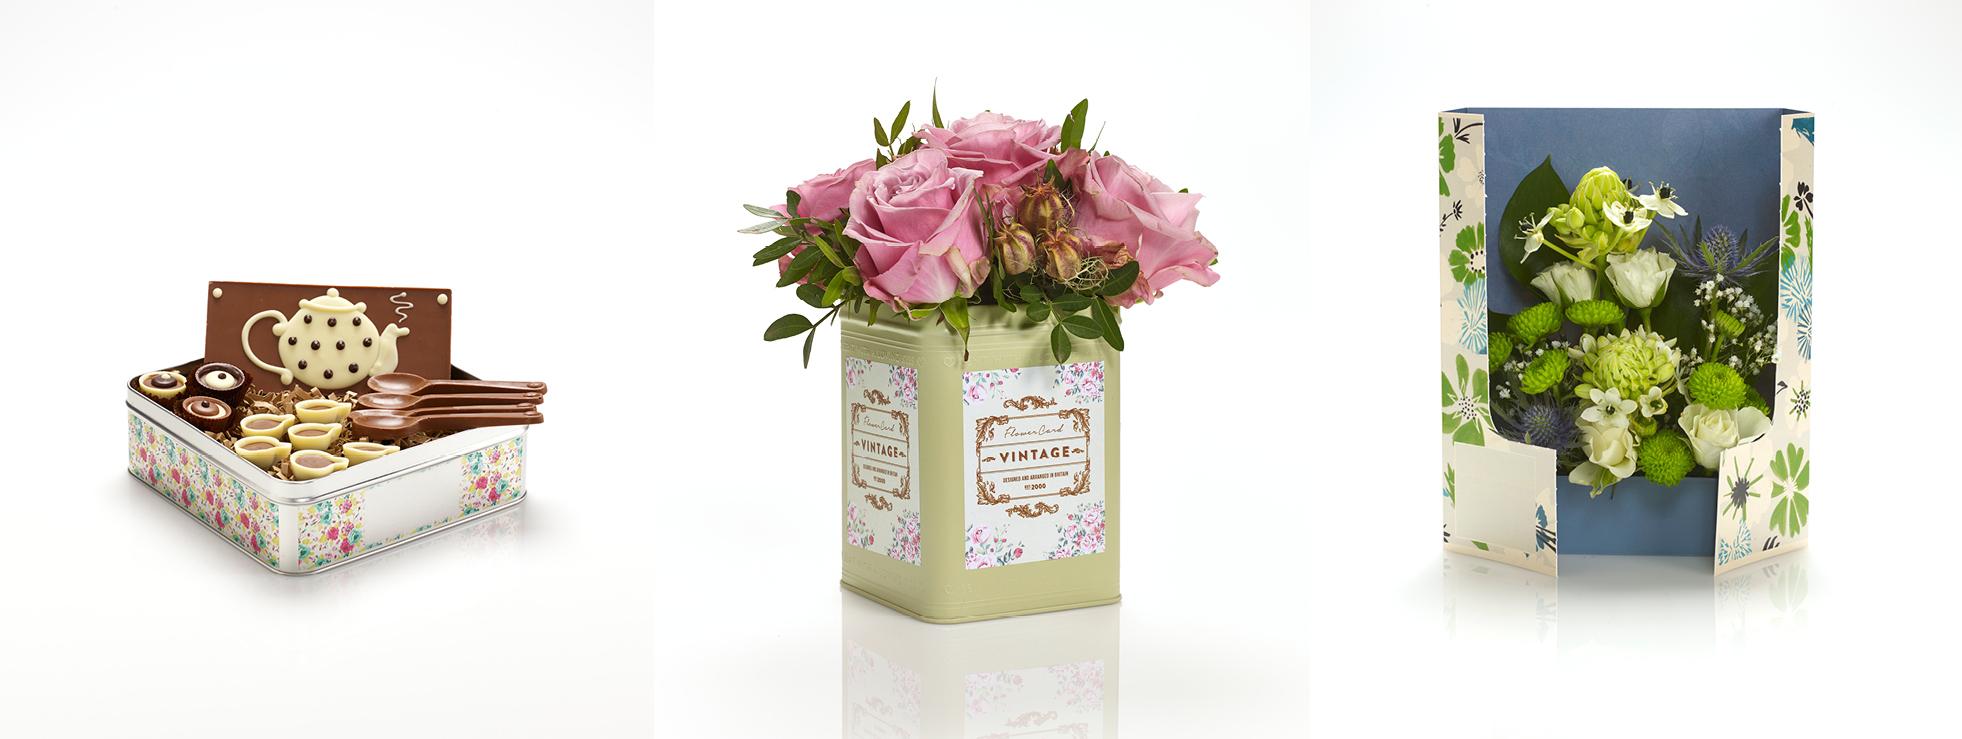 flowercard voucher code